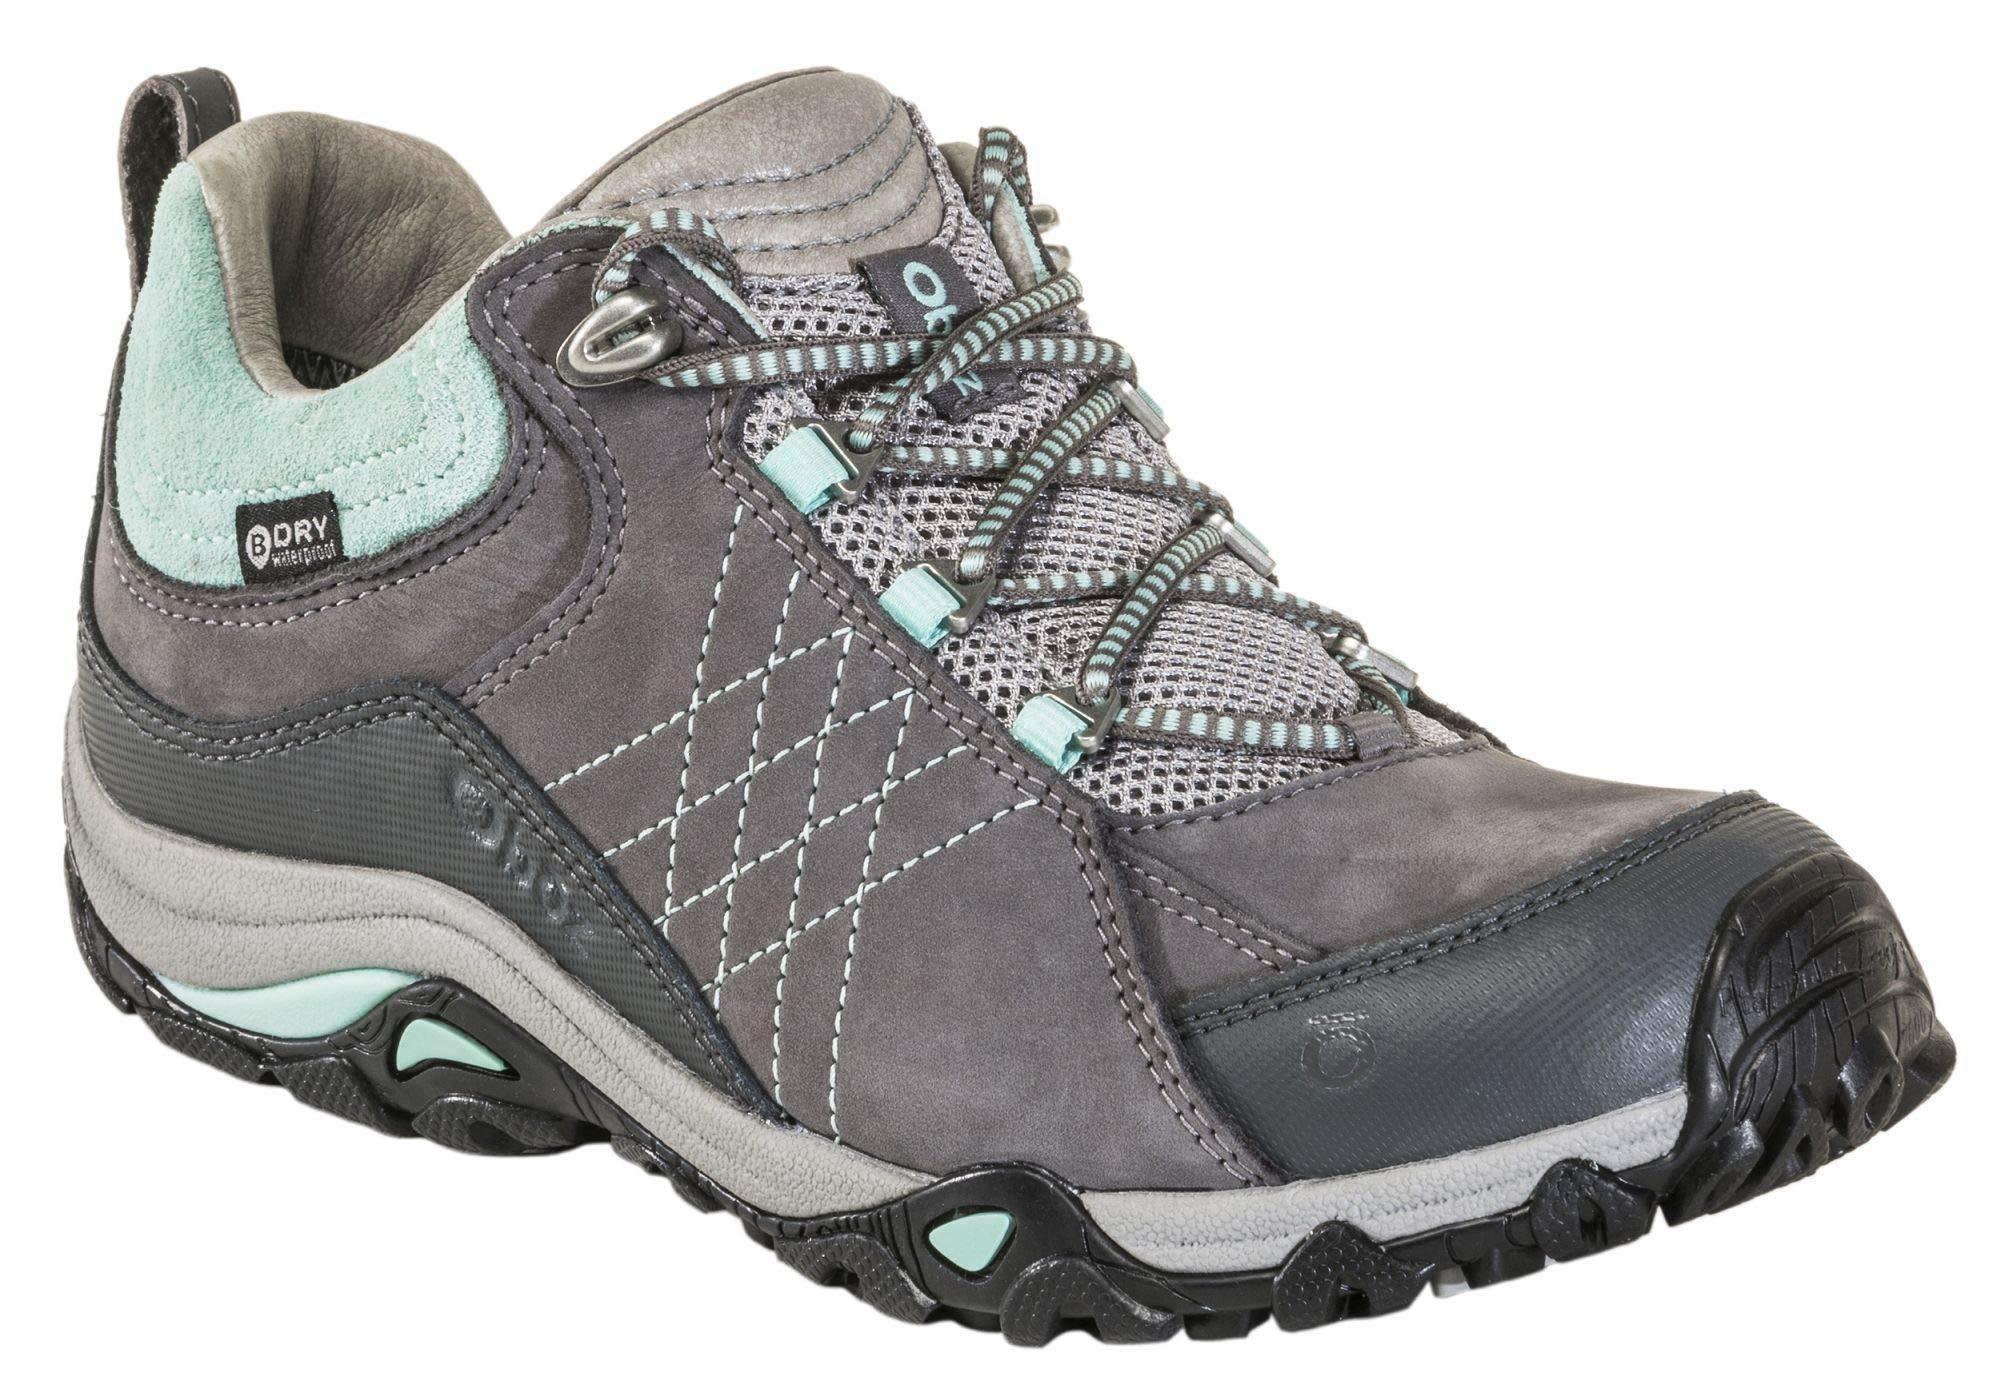 Oboz Sapphire Low B-Dry Hiking Shoe - Women's